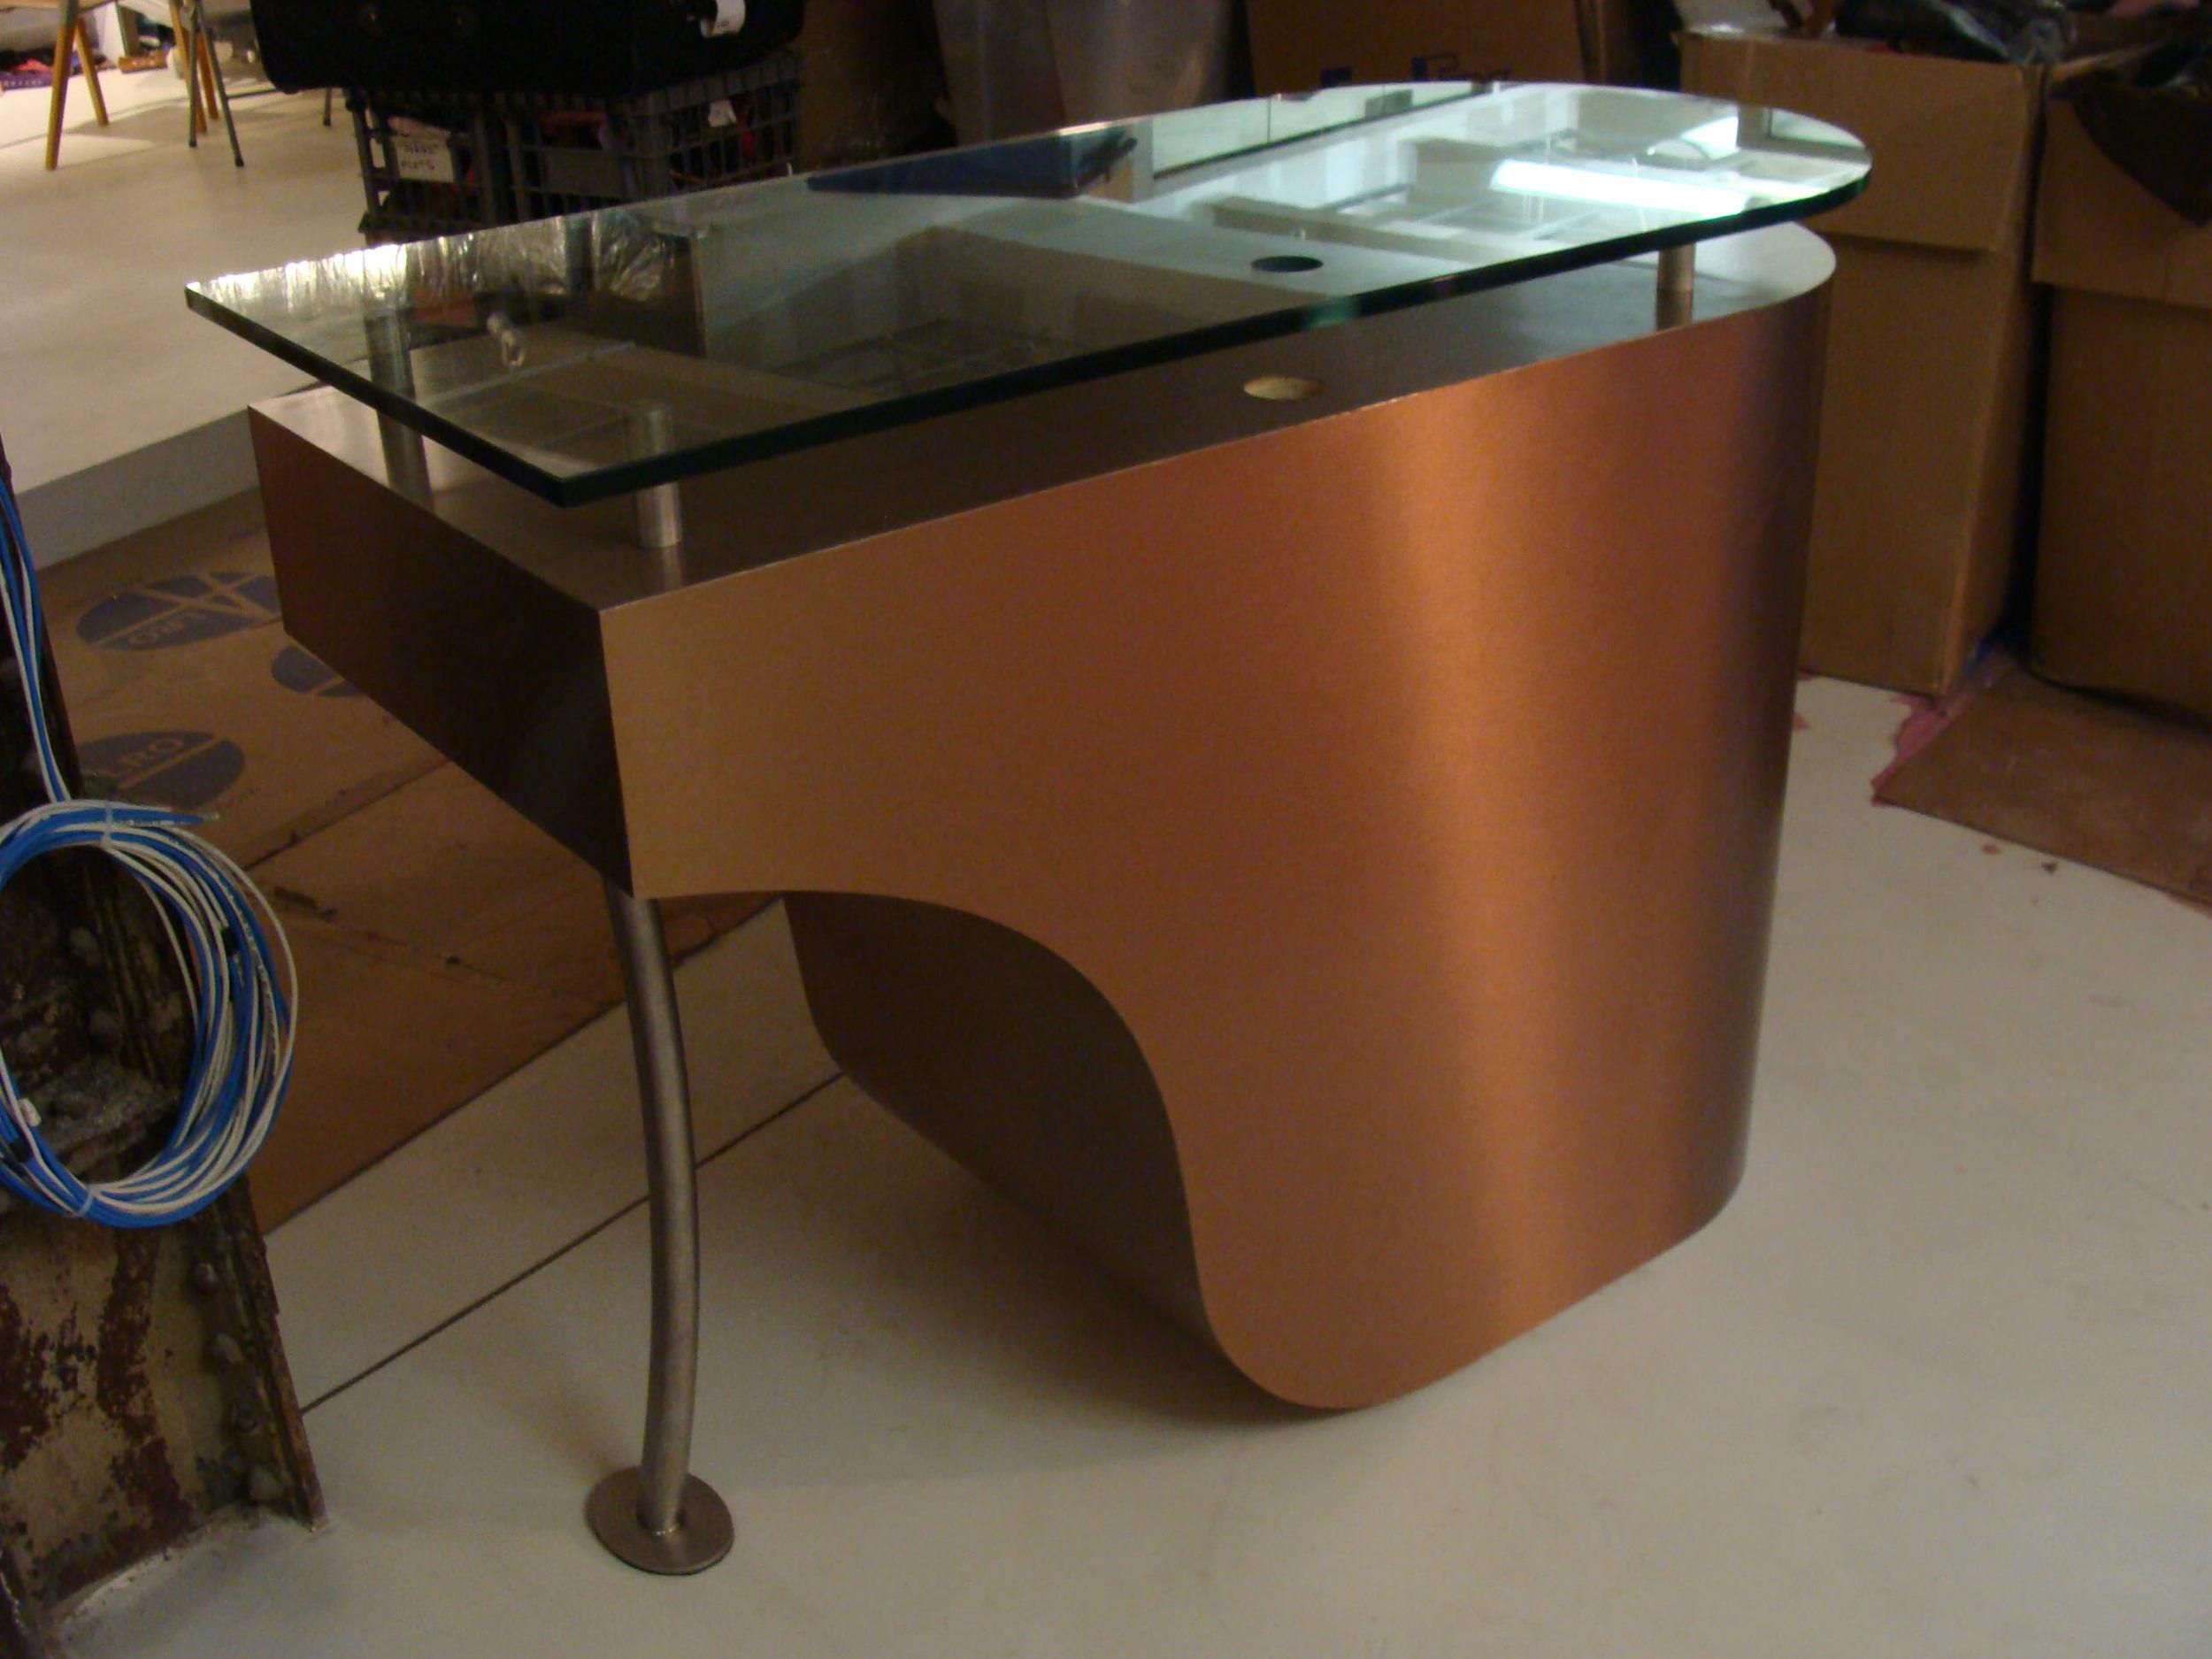 High heel shoe reception desk